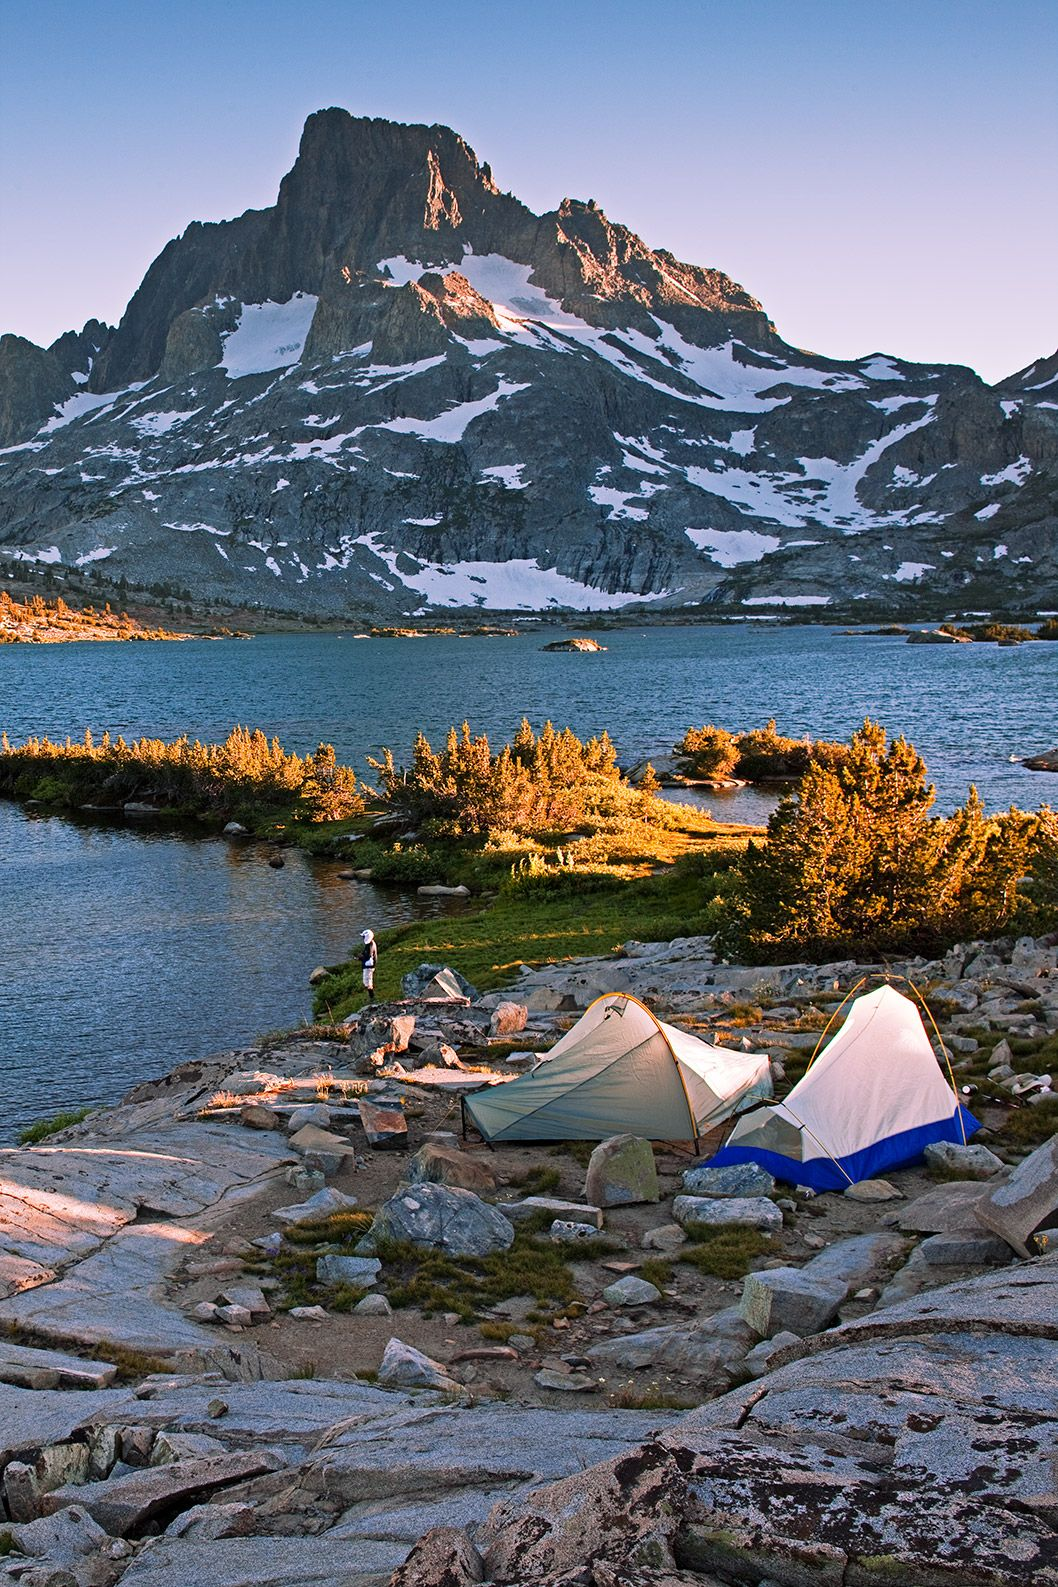 Back Country Camping at Thousand Island Lakes, Ansel Adams